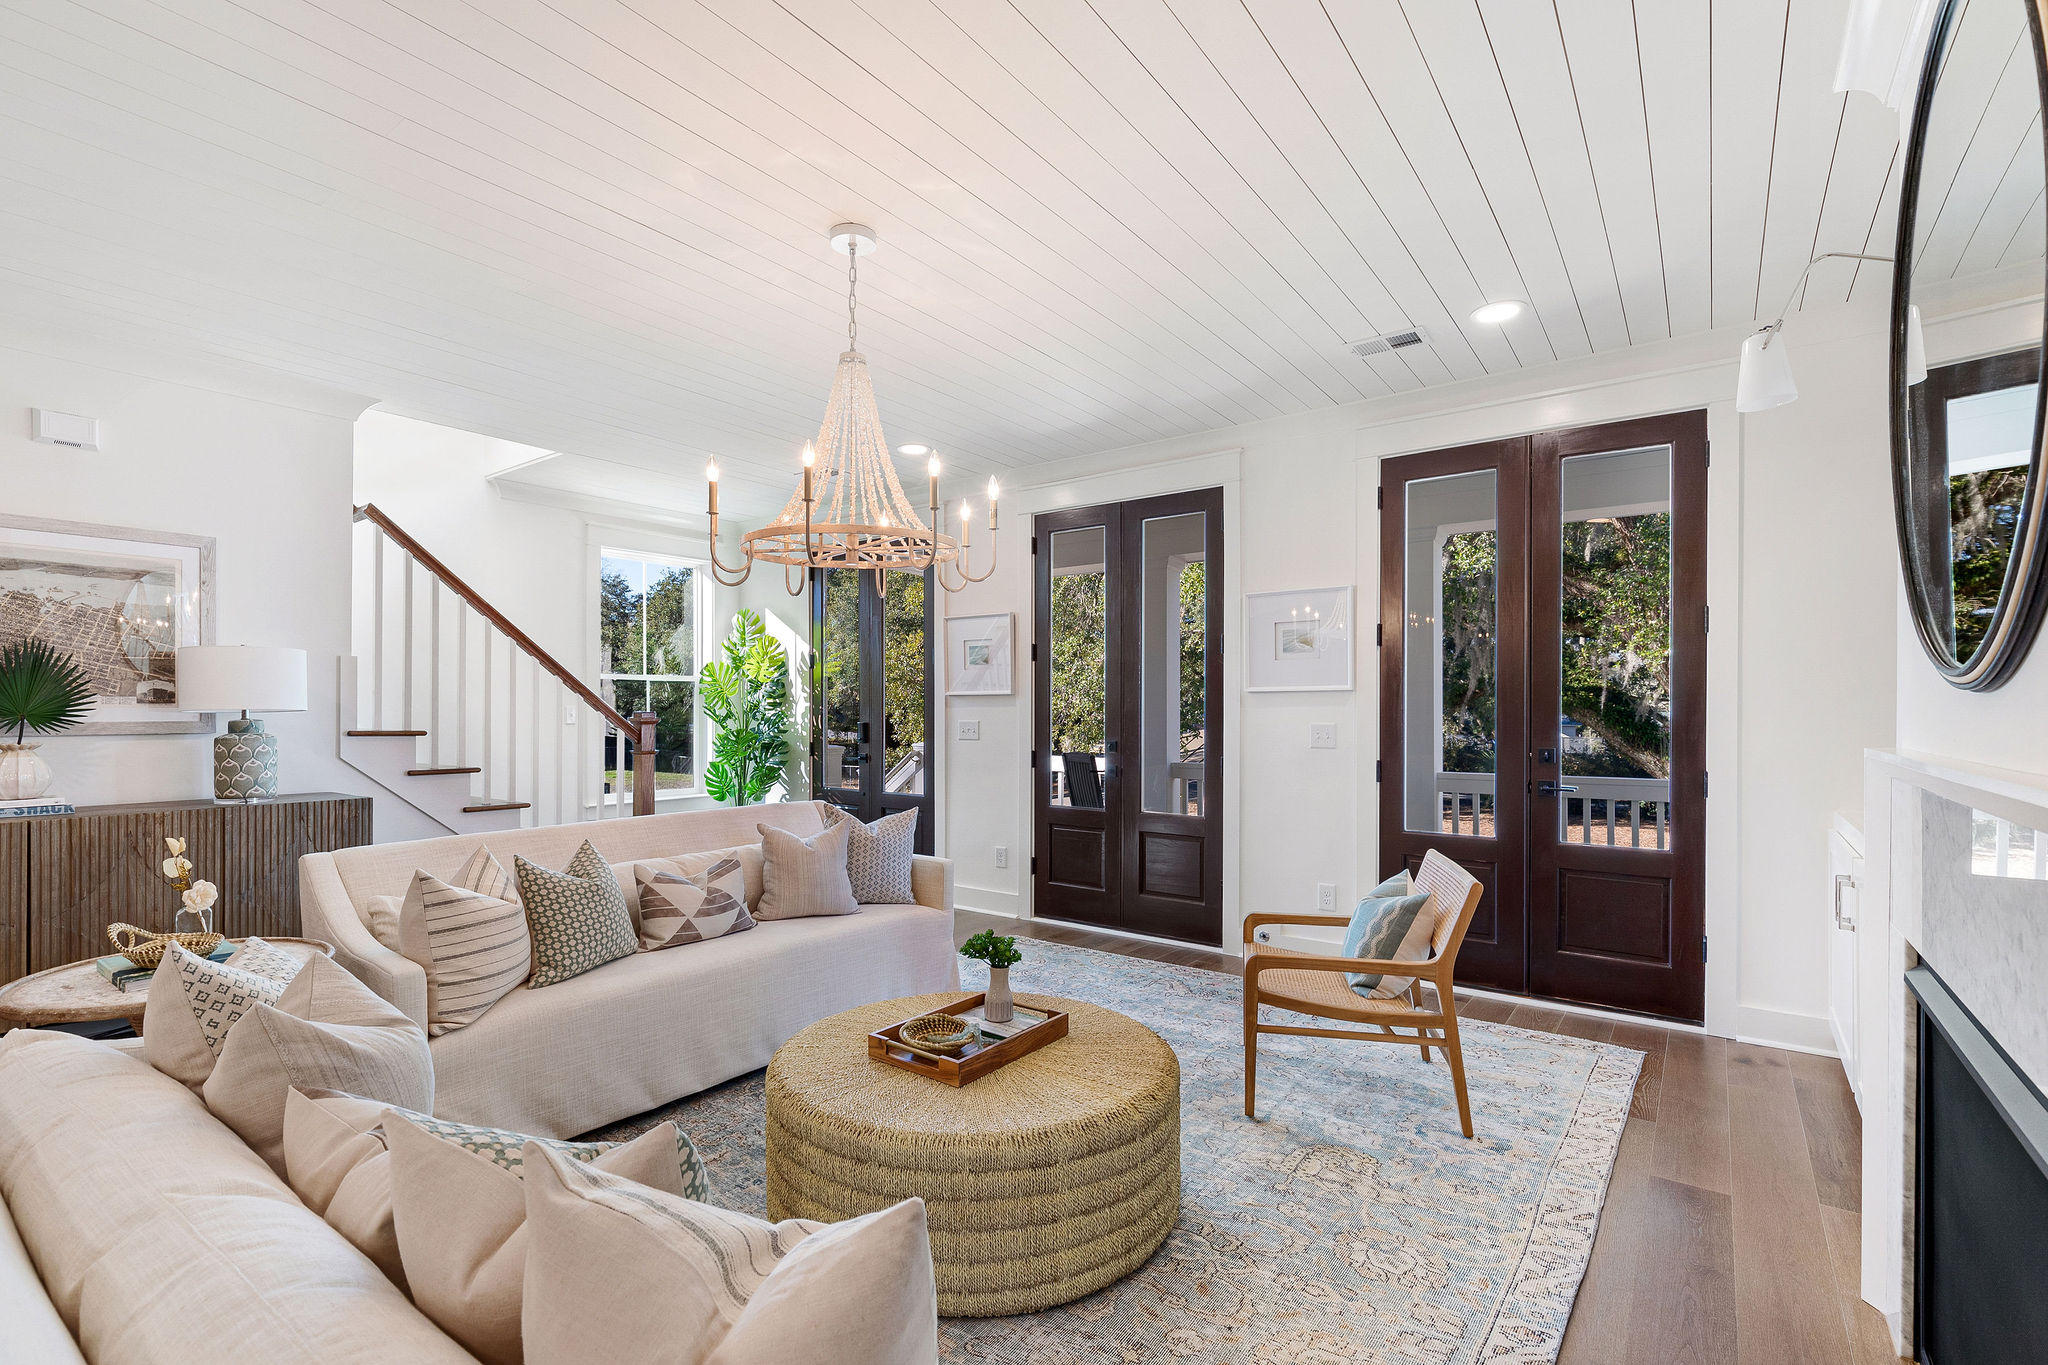 Avenue of Oaks Homes For Sale - 1027 Avenue Of Oaks, Charleston, SC - 41